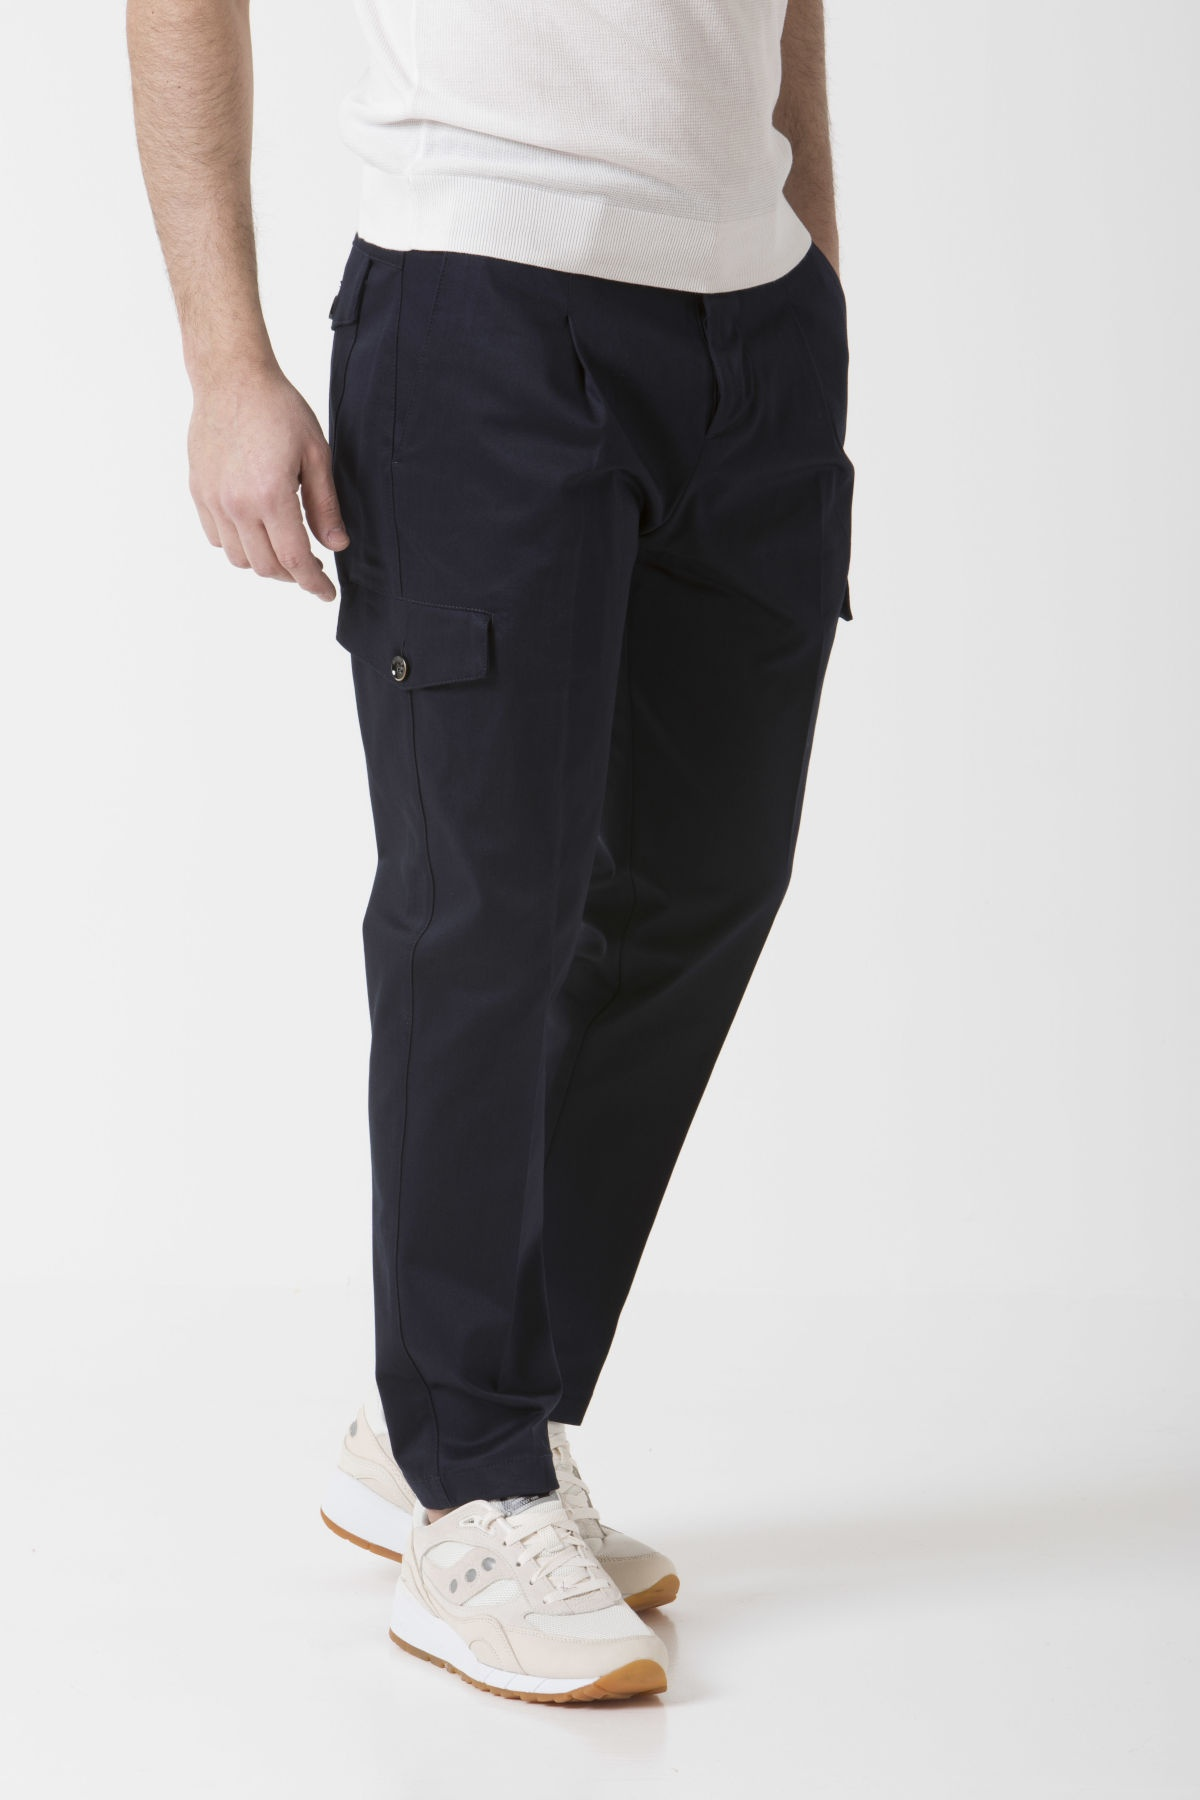 Pantaloni CARGO per uomo PAOLO PECORA P/E 19